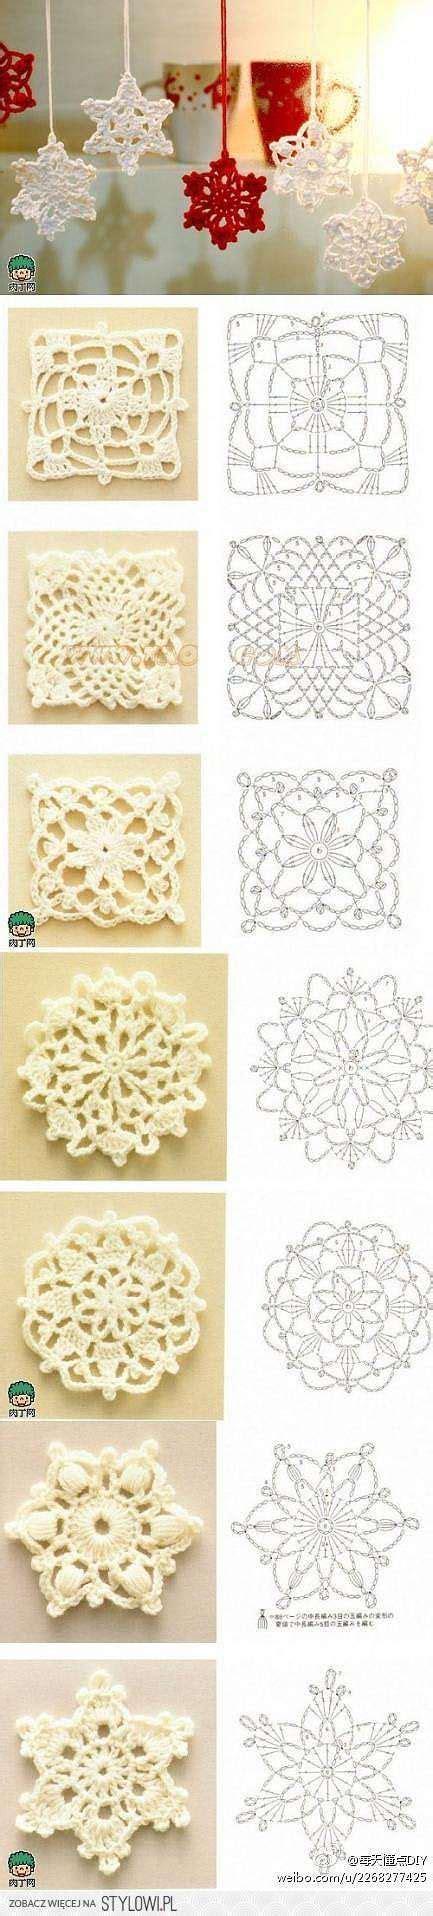 crochet granny square  images  pinterest